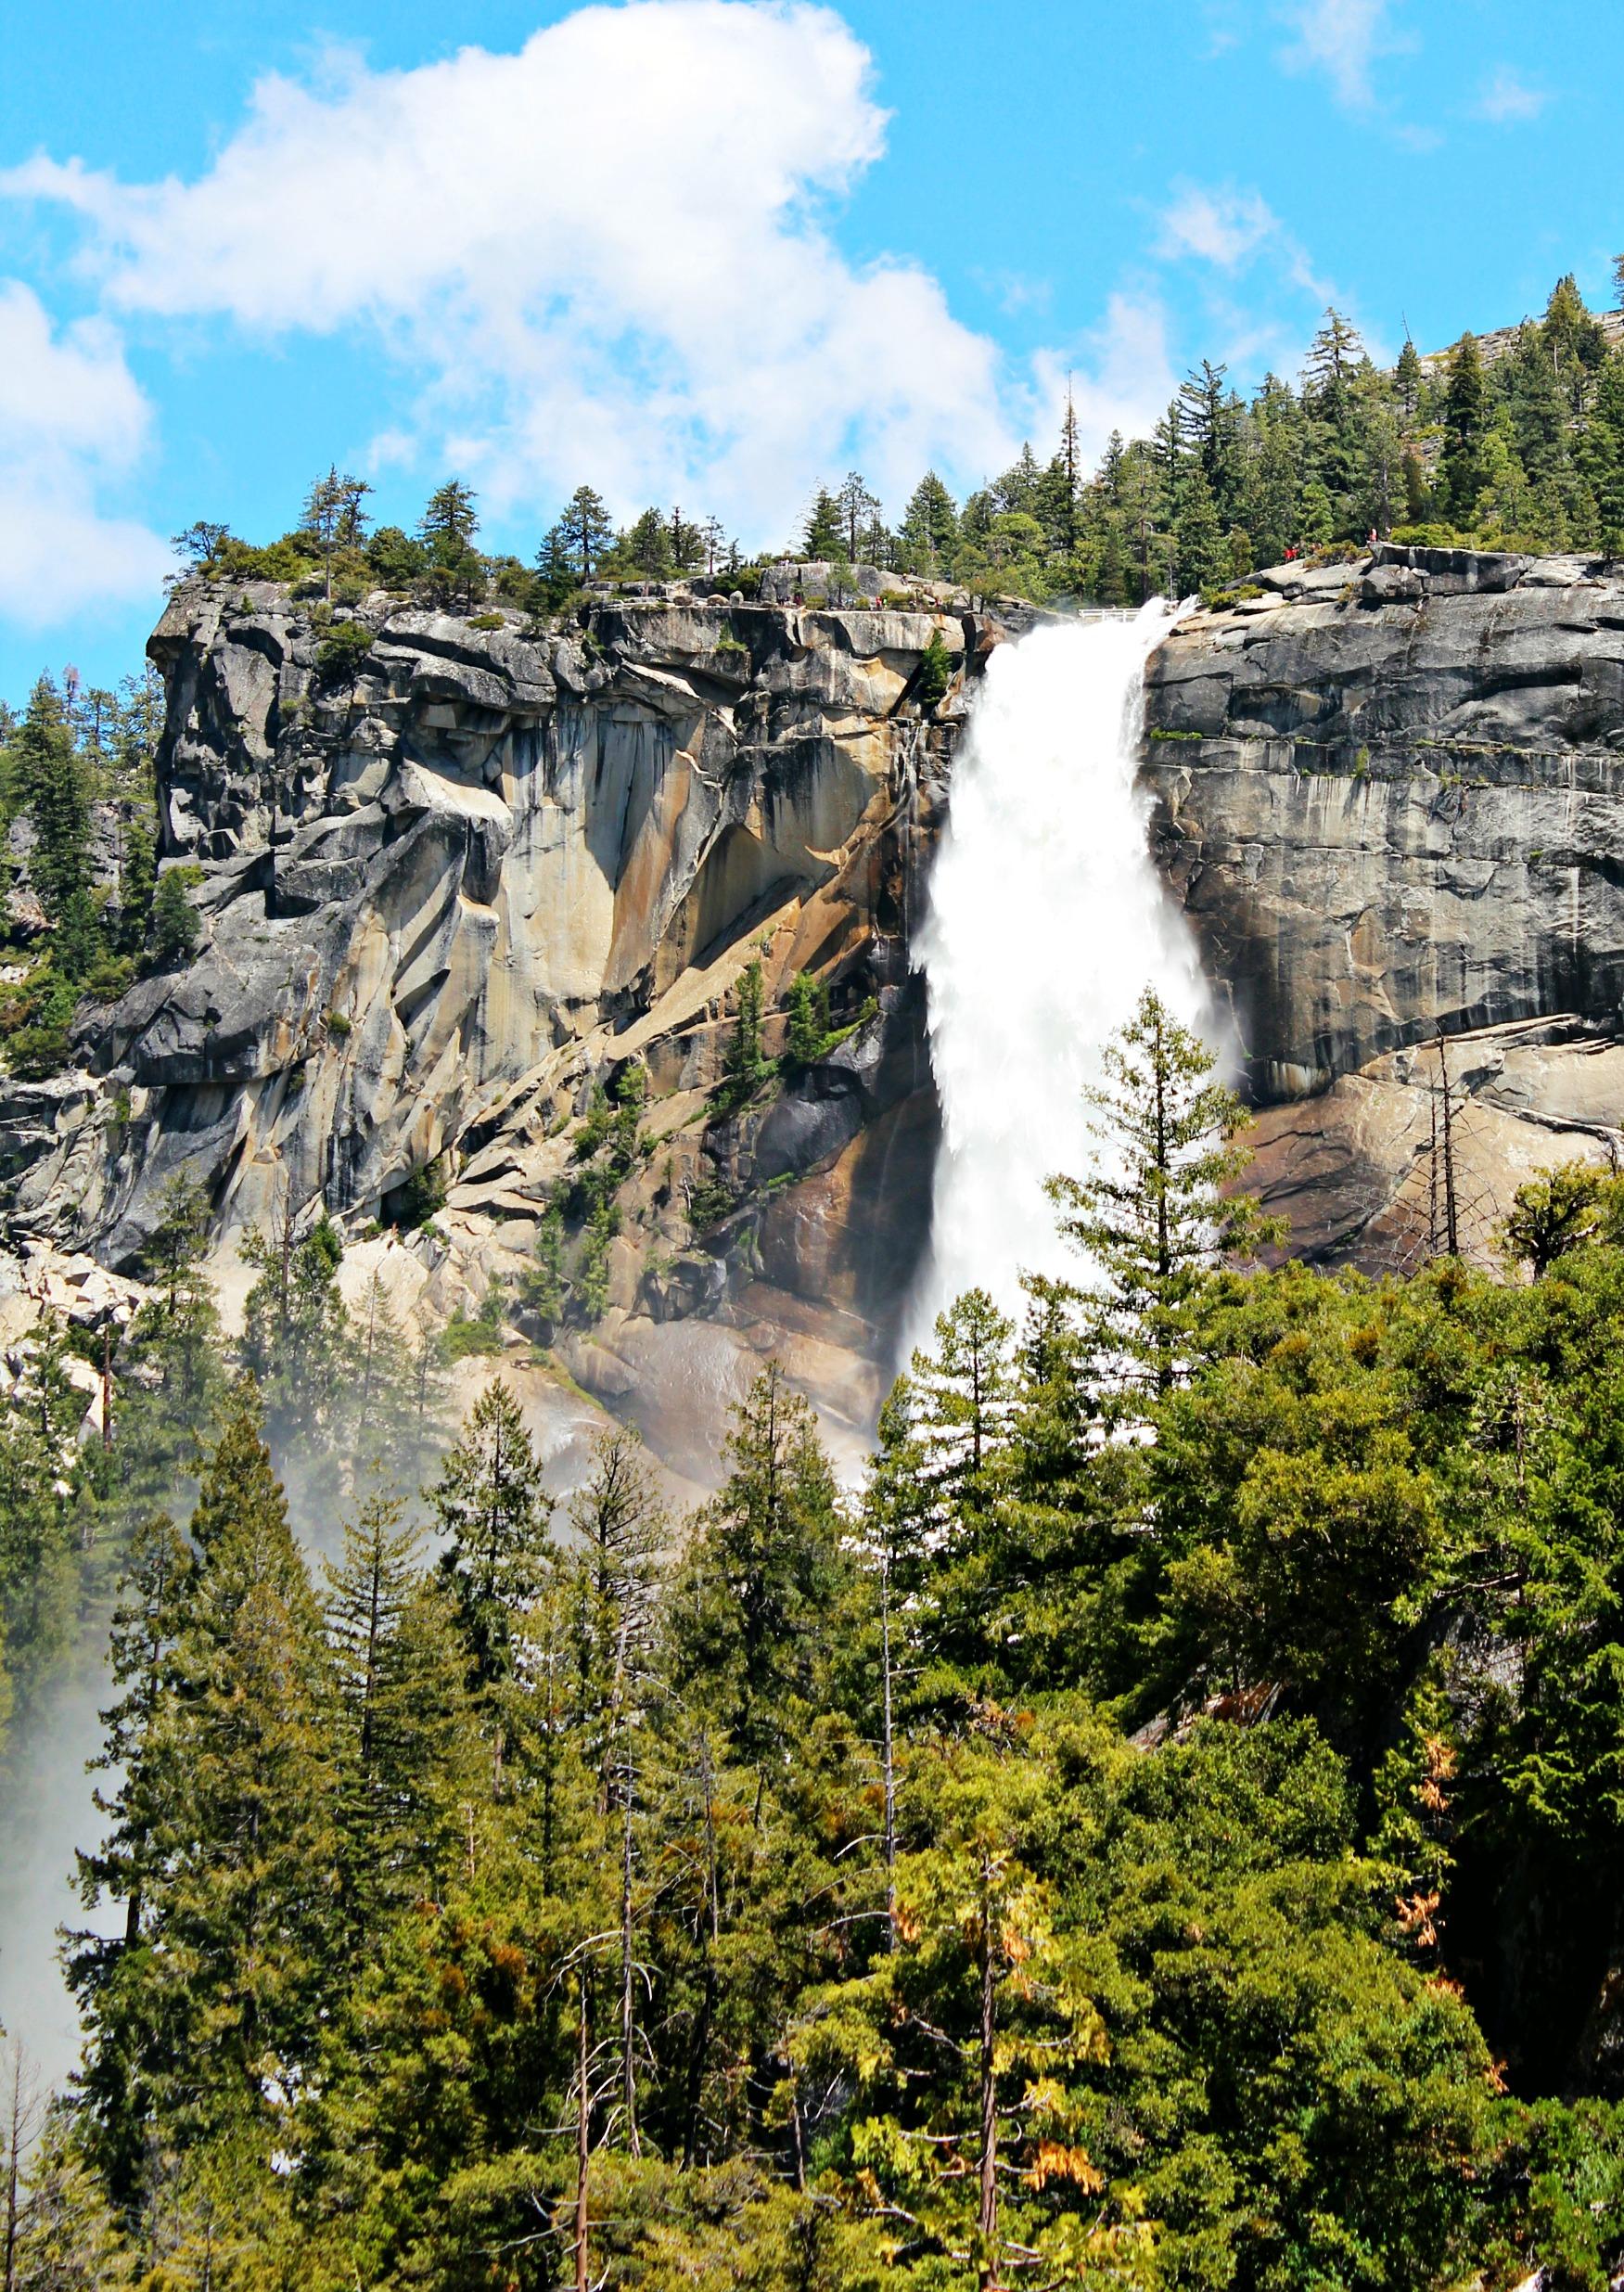 vernal-falls-trail-yosemite-national-park